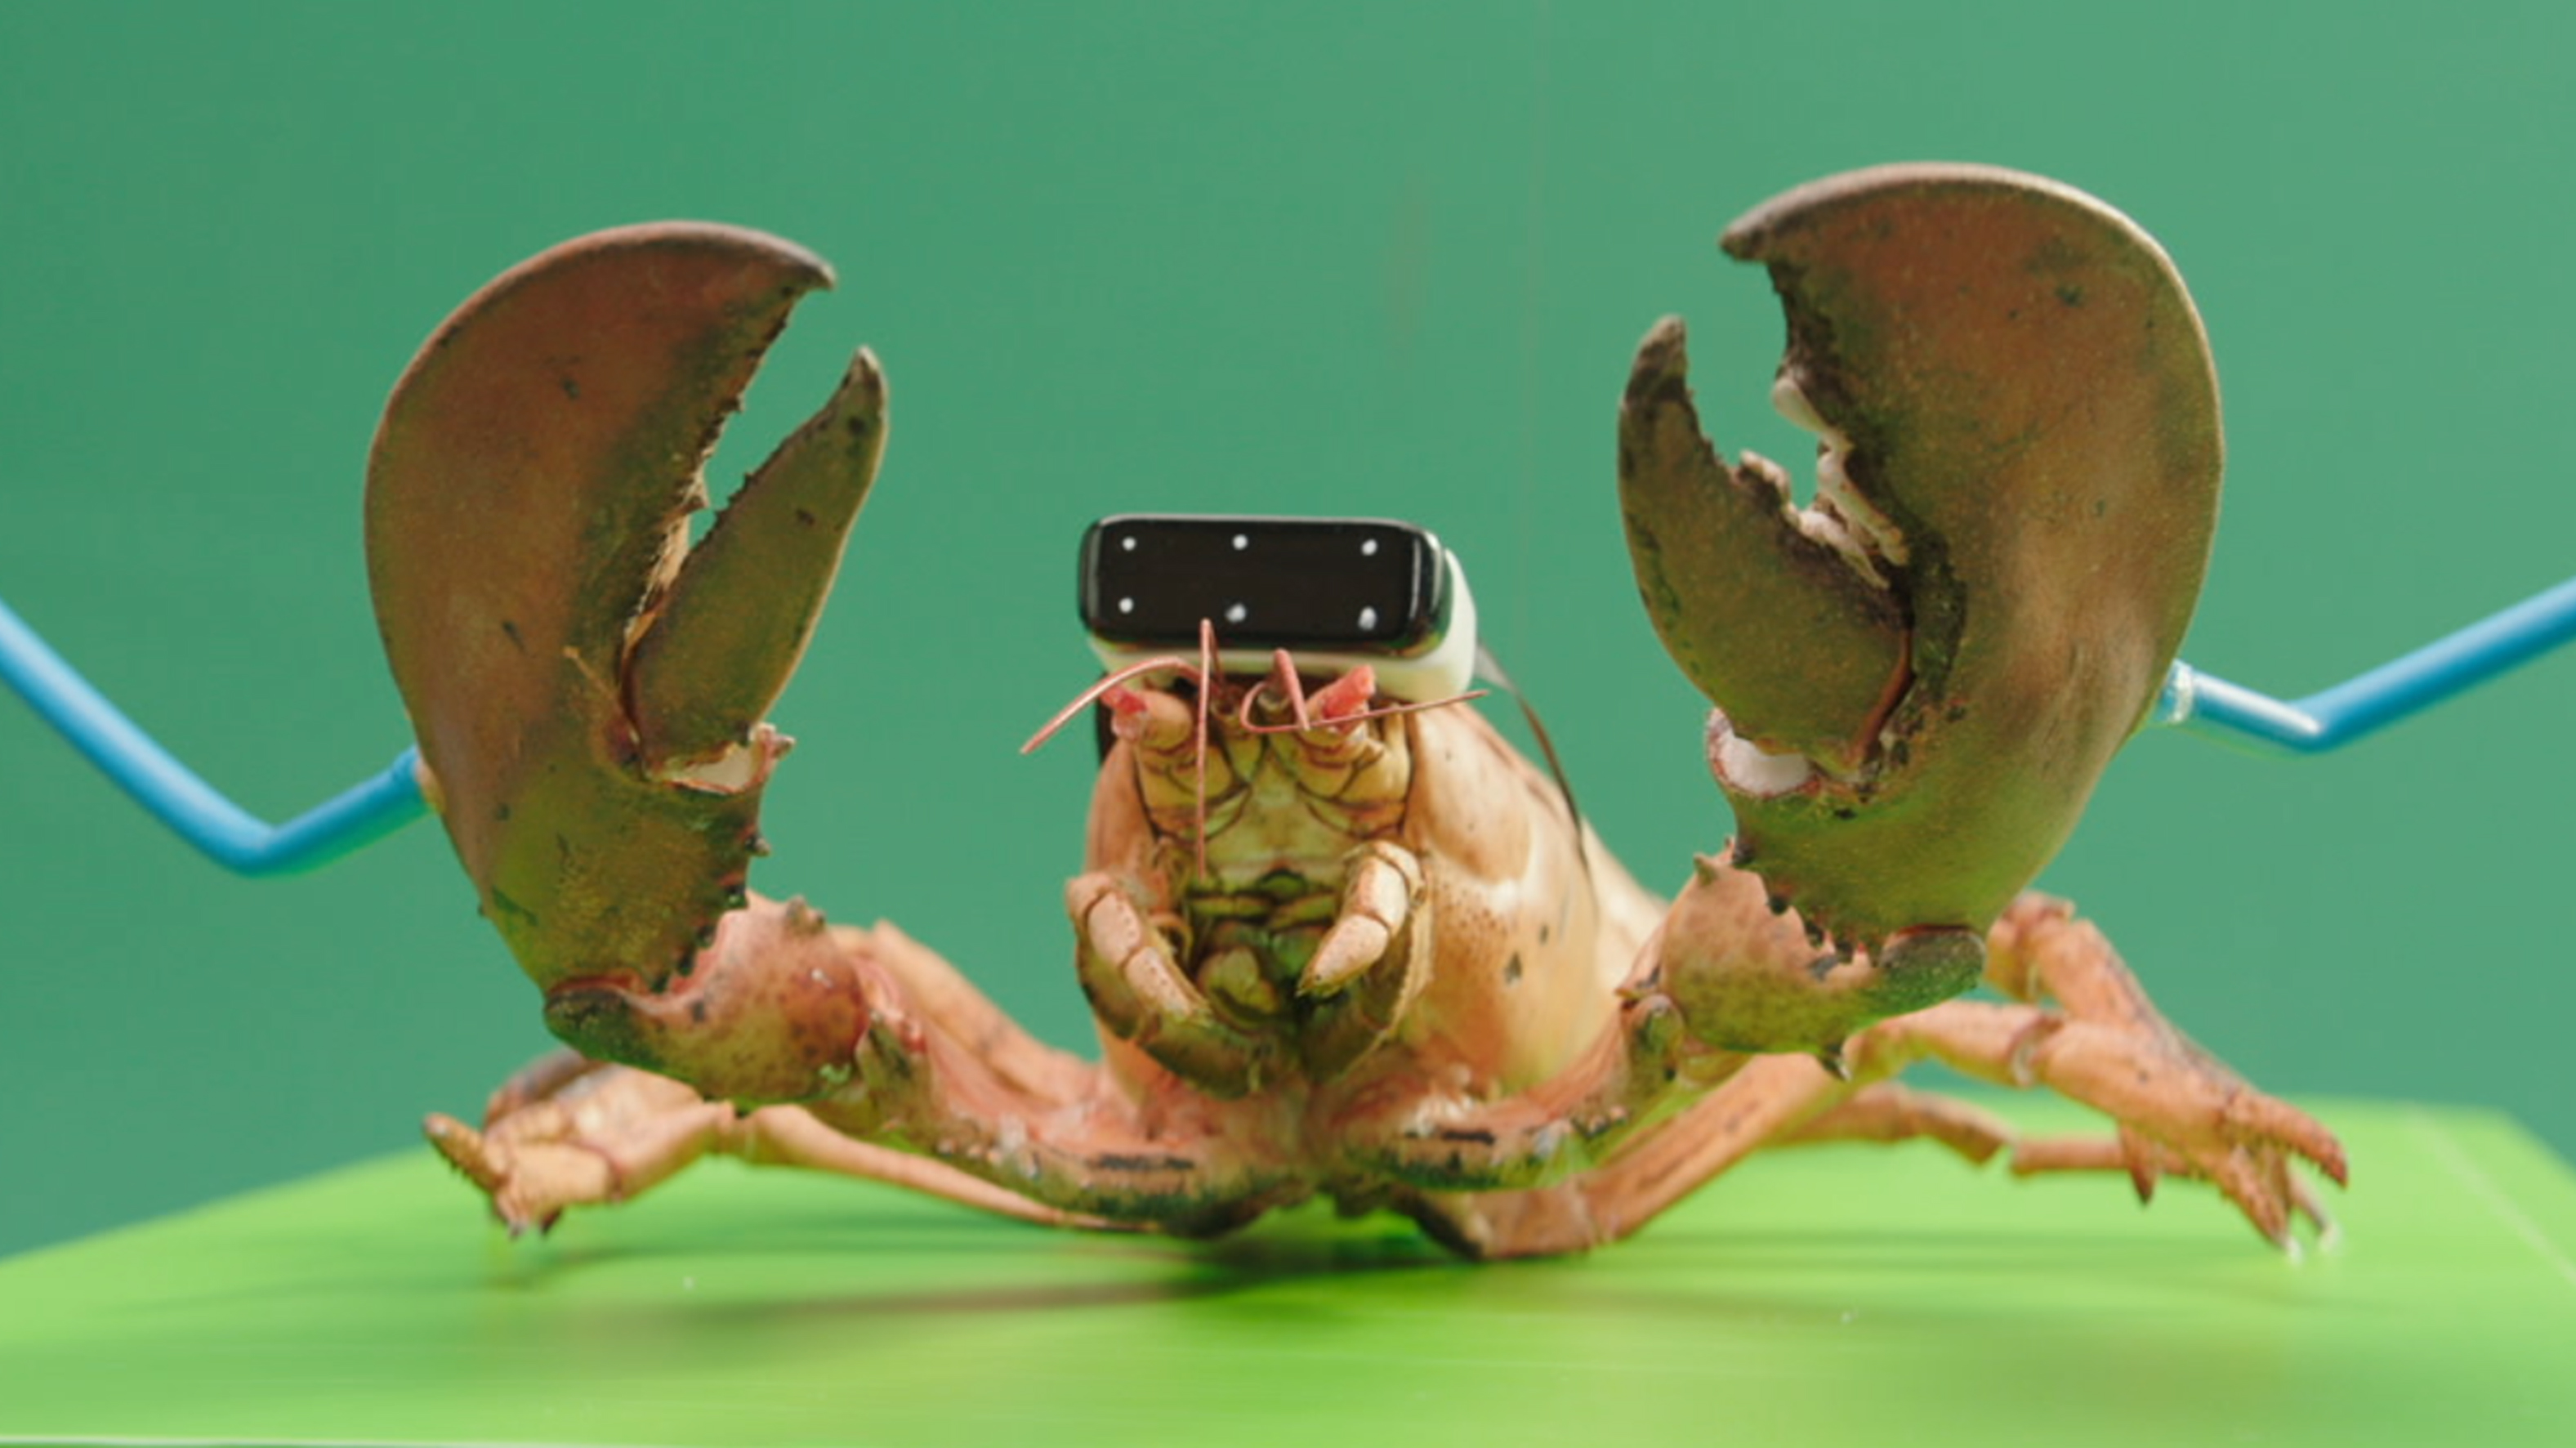 TELE2 Lobster